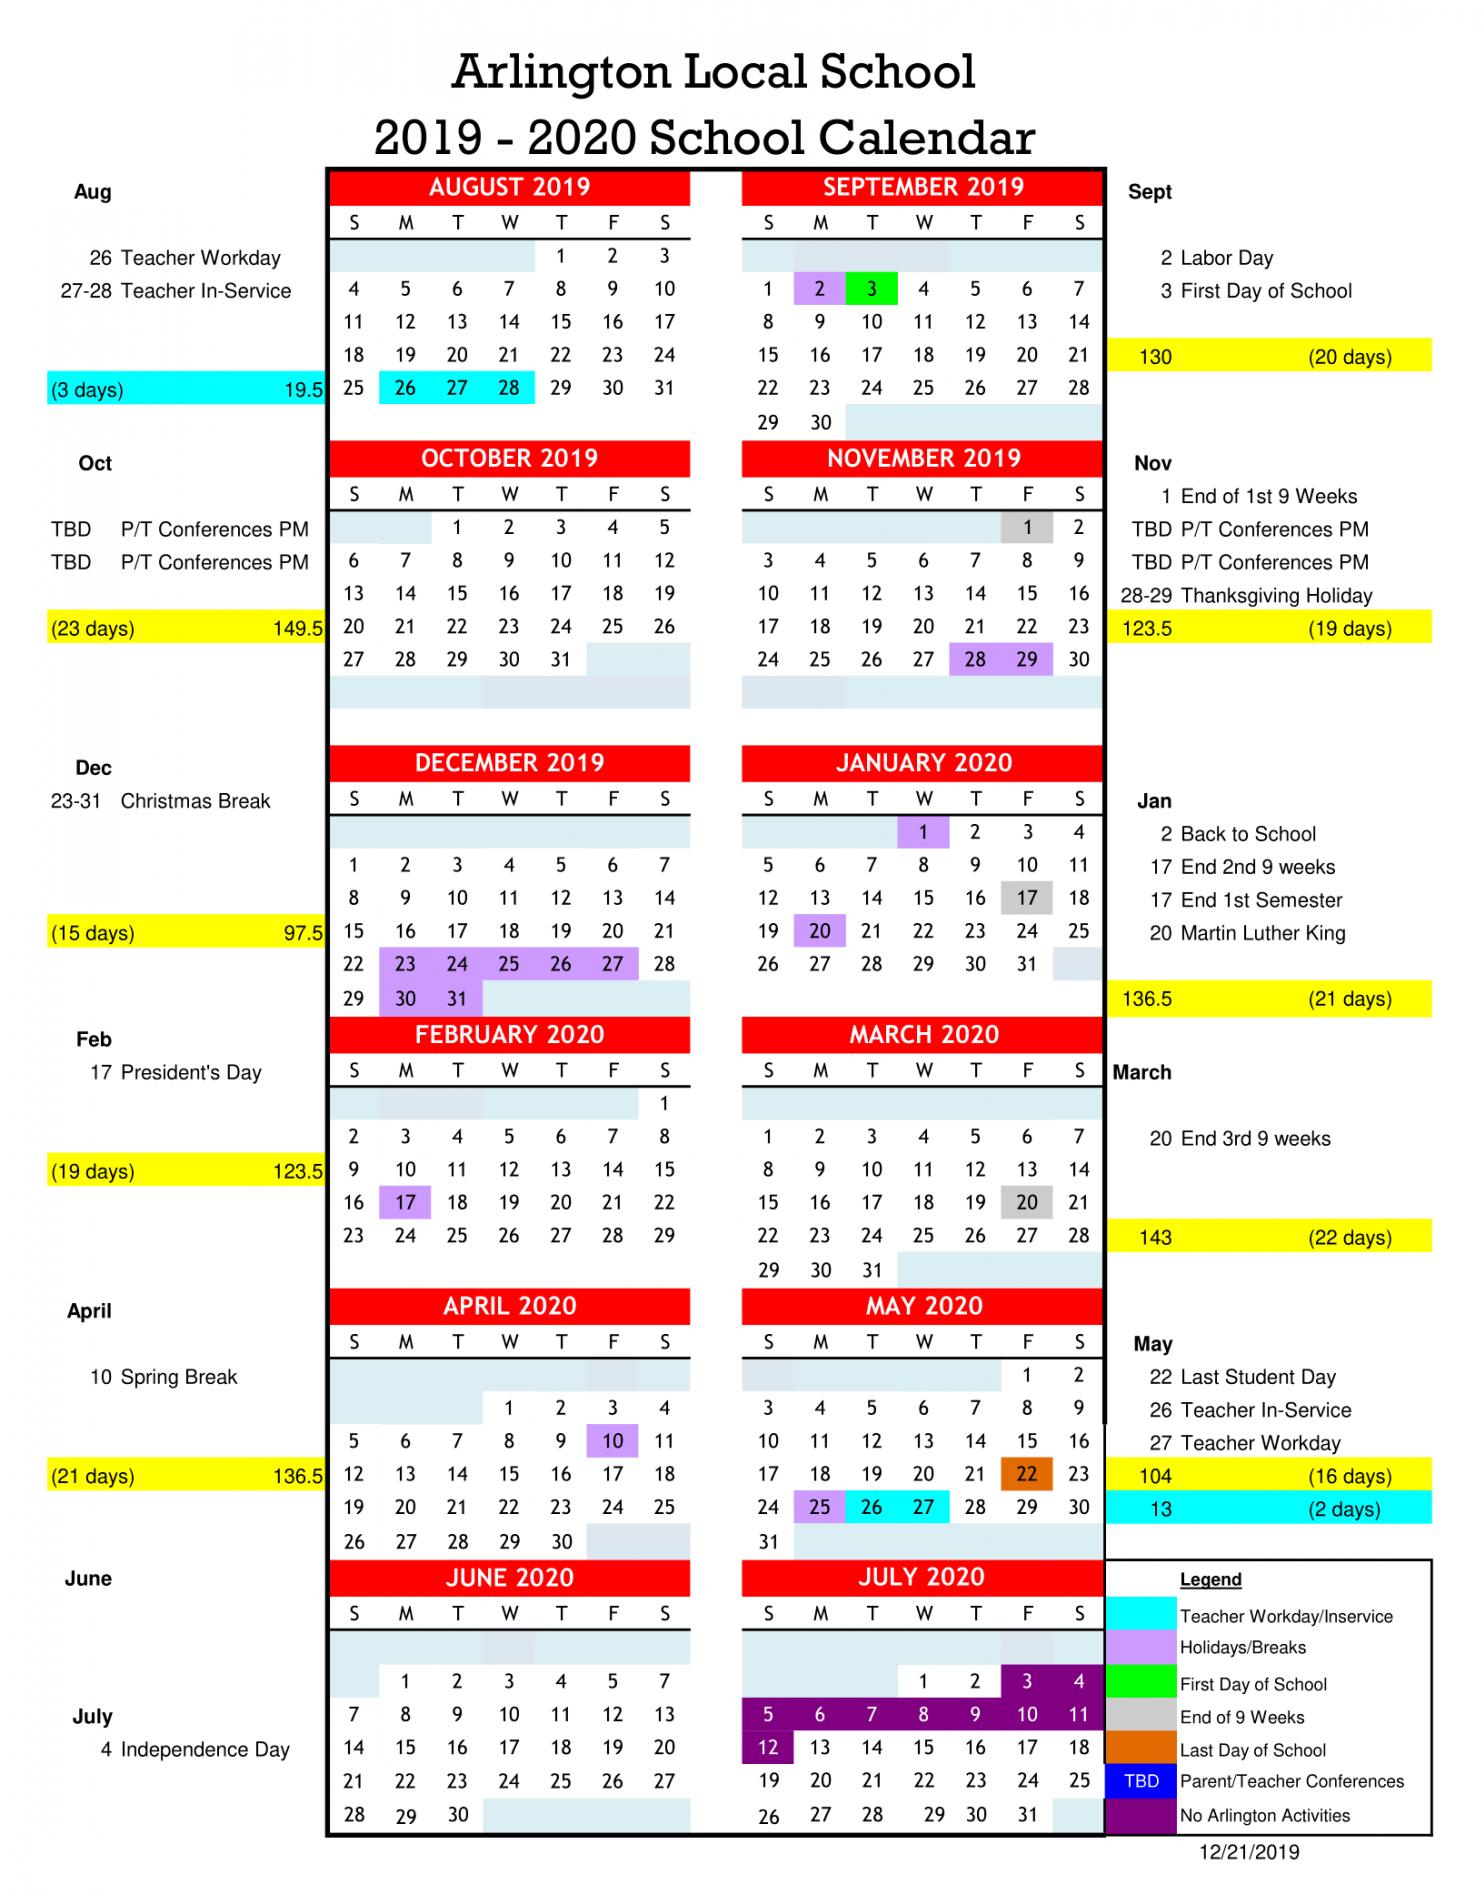 School Calendars - Arlington Local Schools Regarding University Of Findlay Academic Calendar 2021